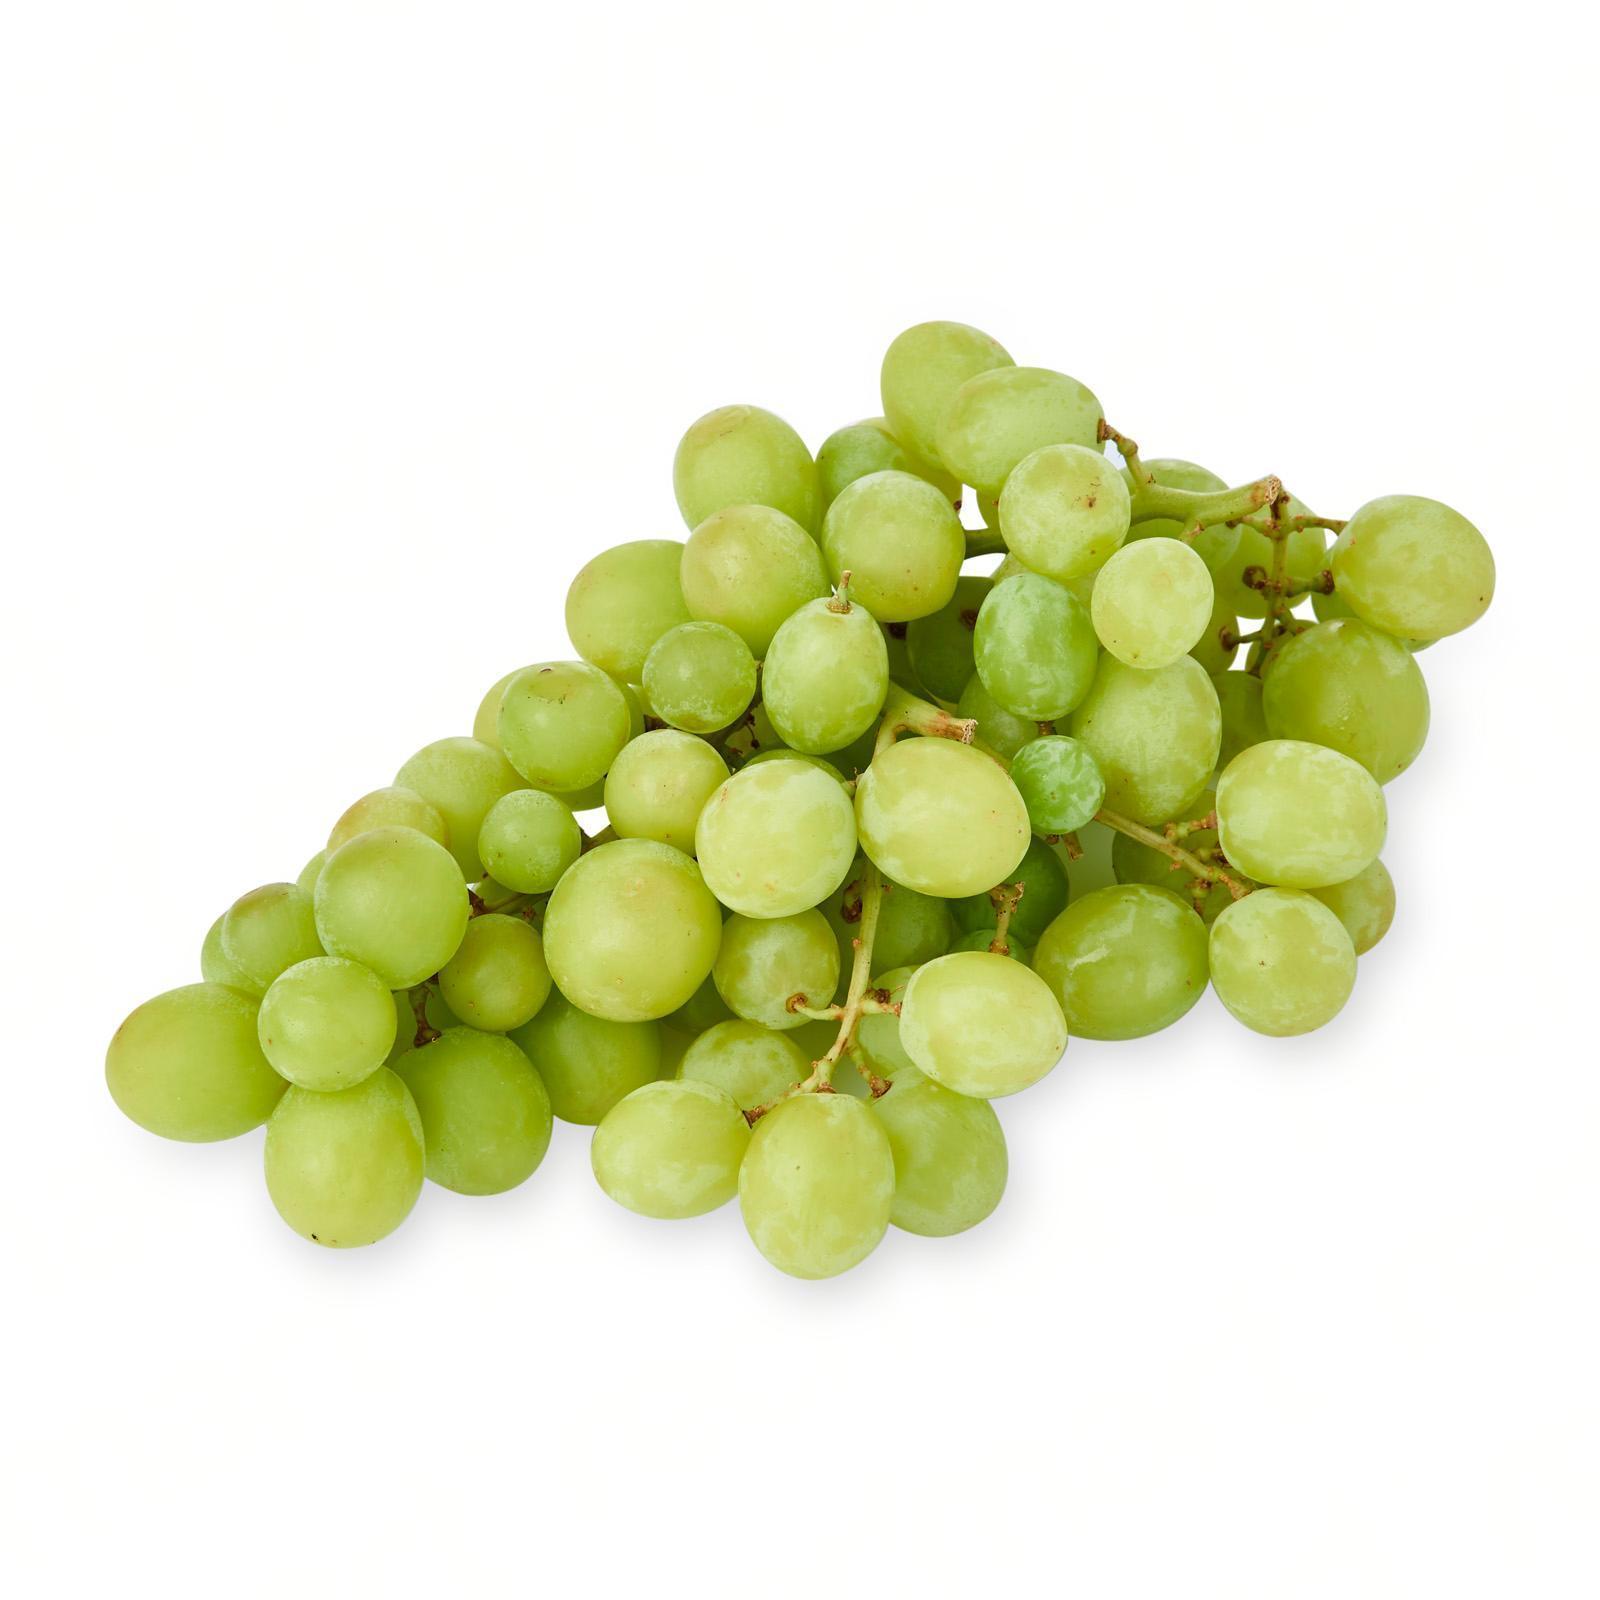 Green Seedless Grapes (Air-Flown)